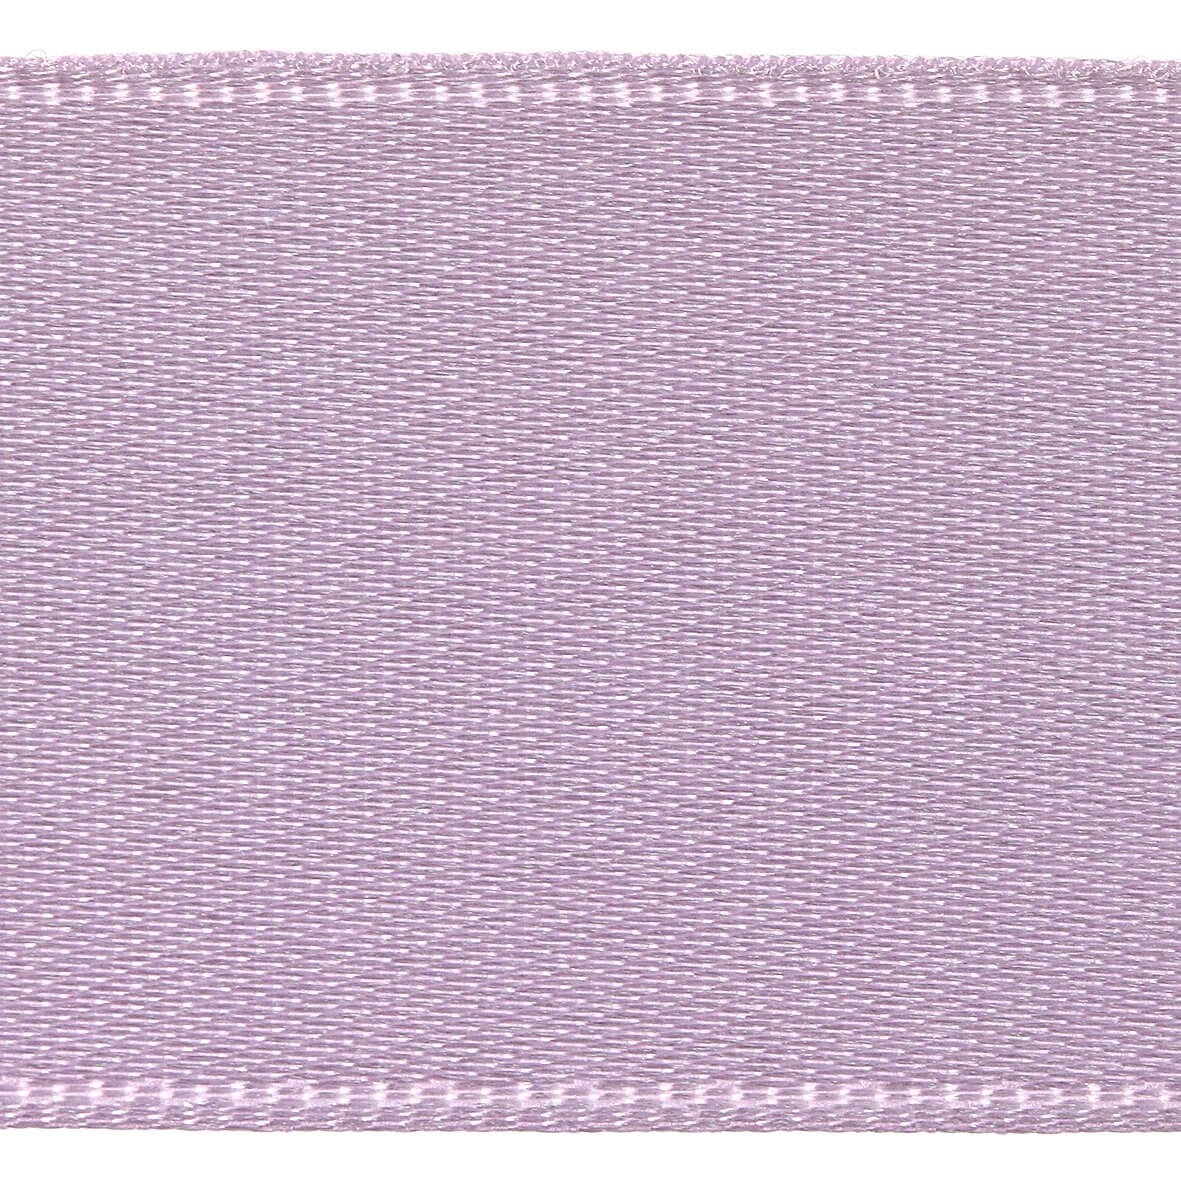 10mm Berisfords Satin Ribbon - Helio Colour 7